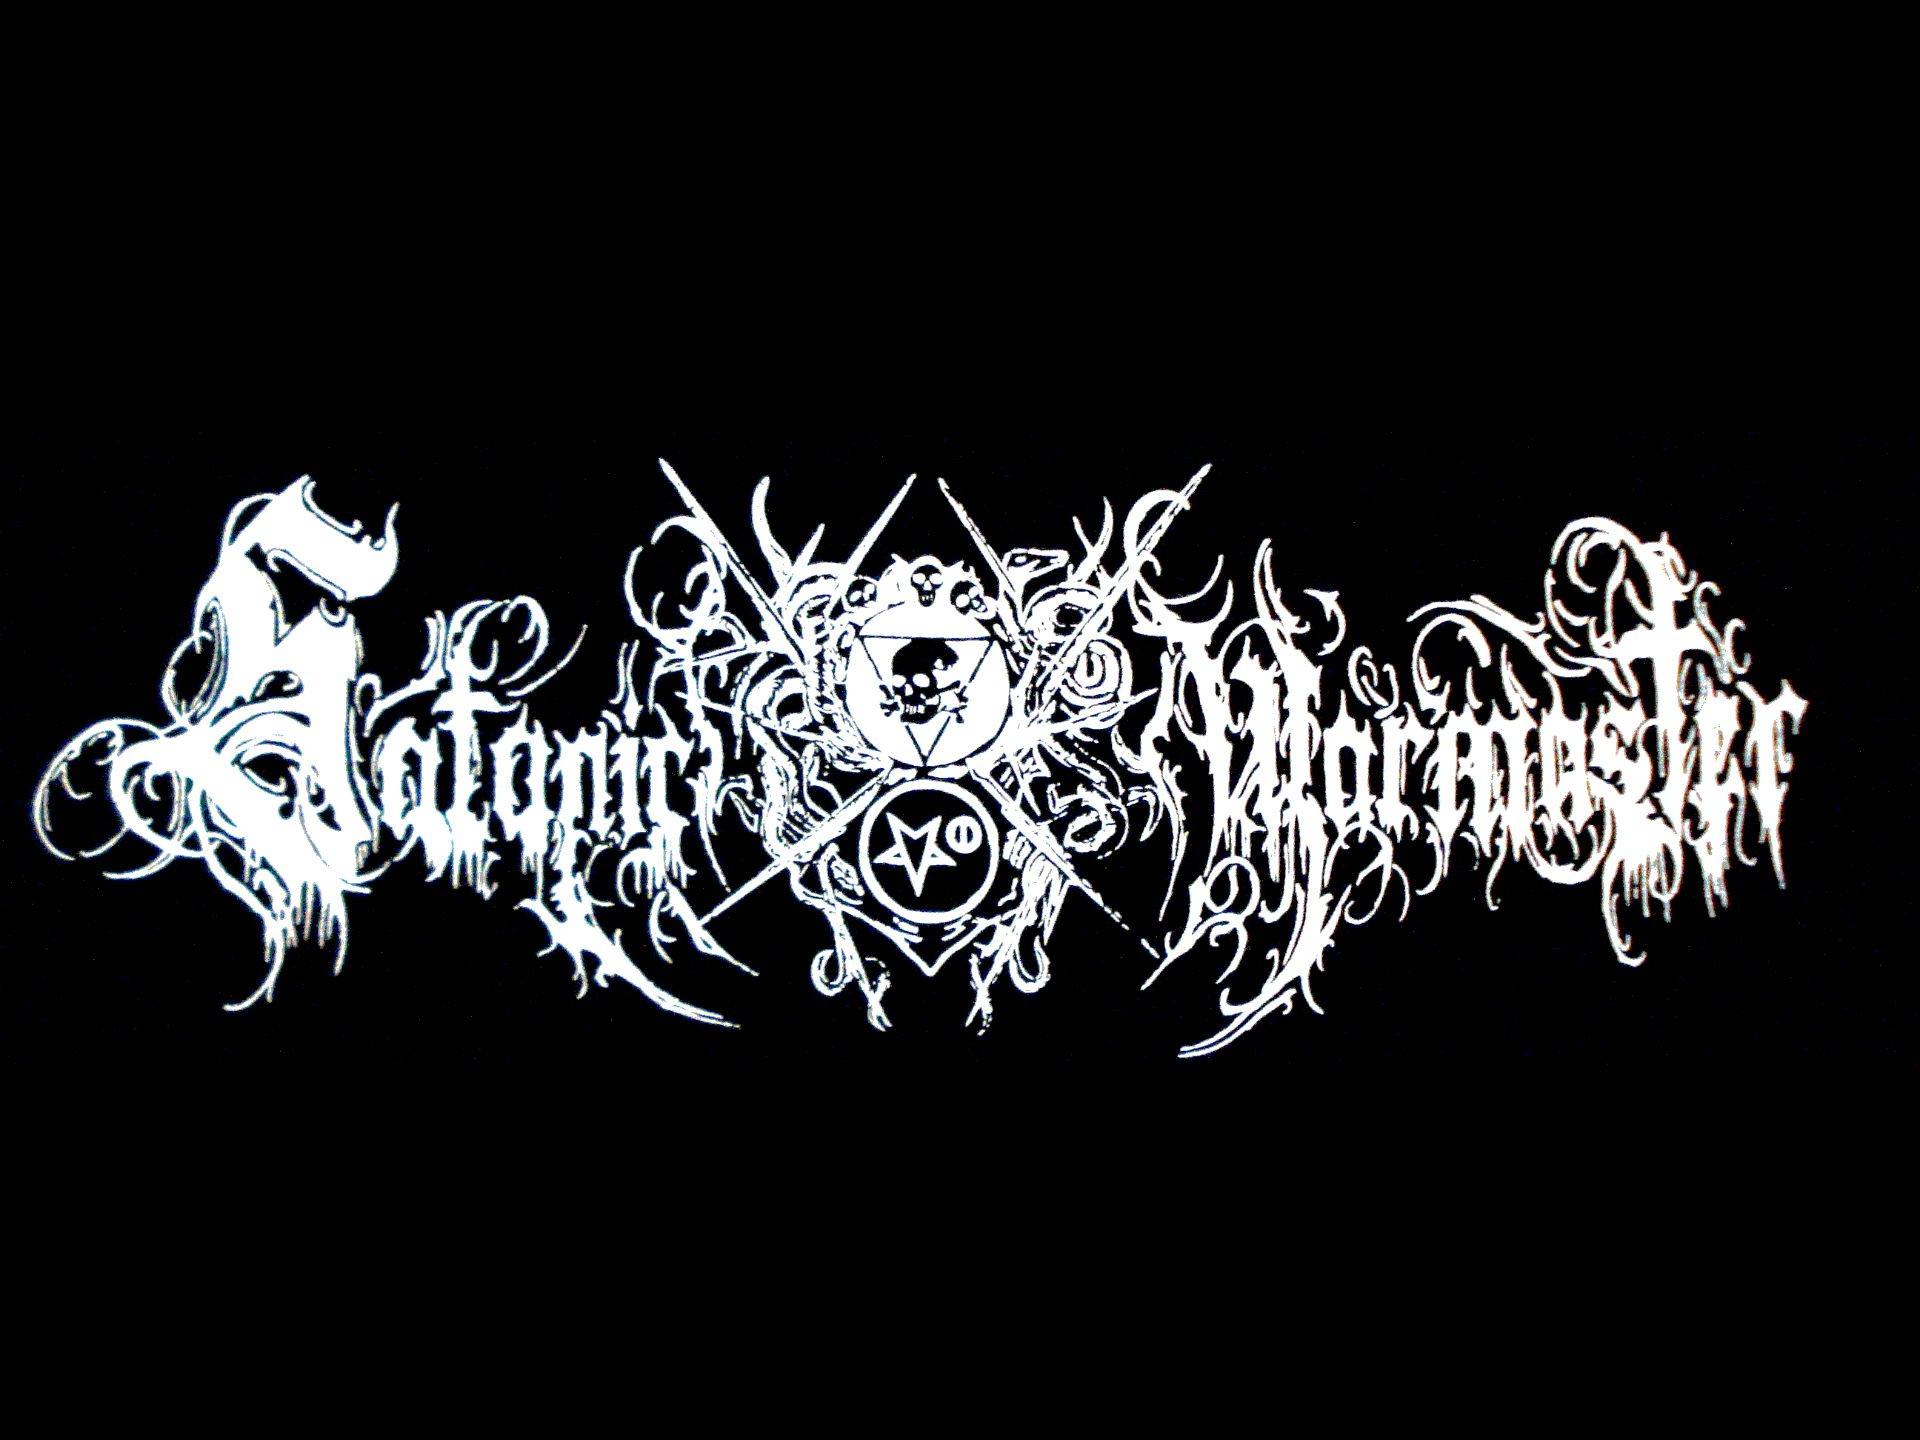 SATANIC WARMASTER Black Metal Heavy Dark Rw Wallpaper